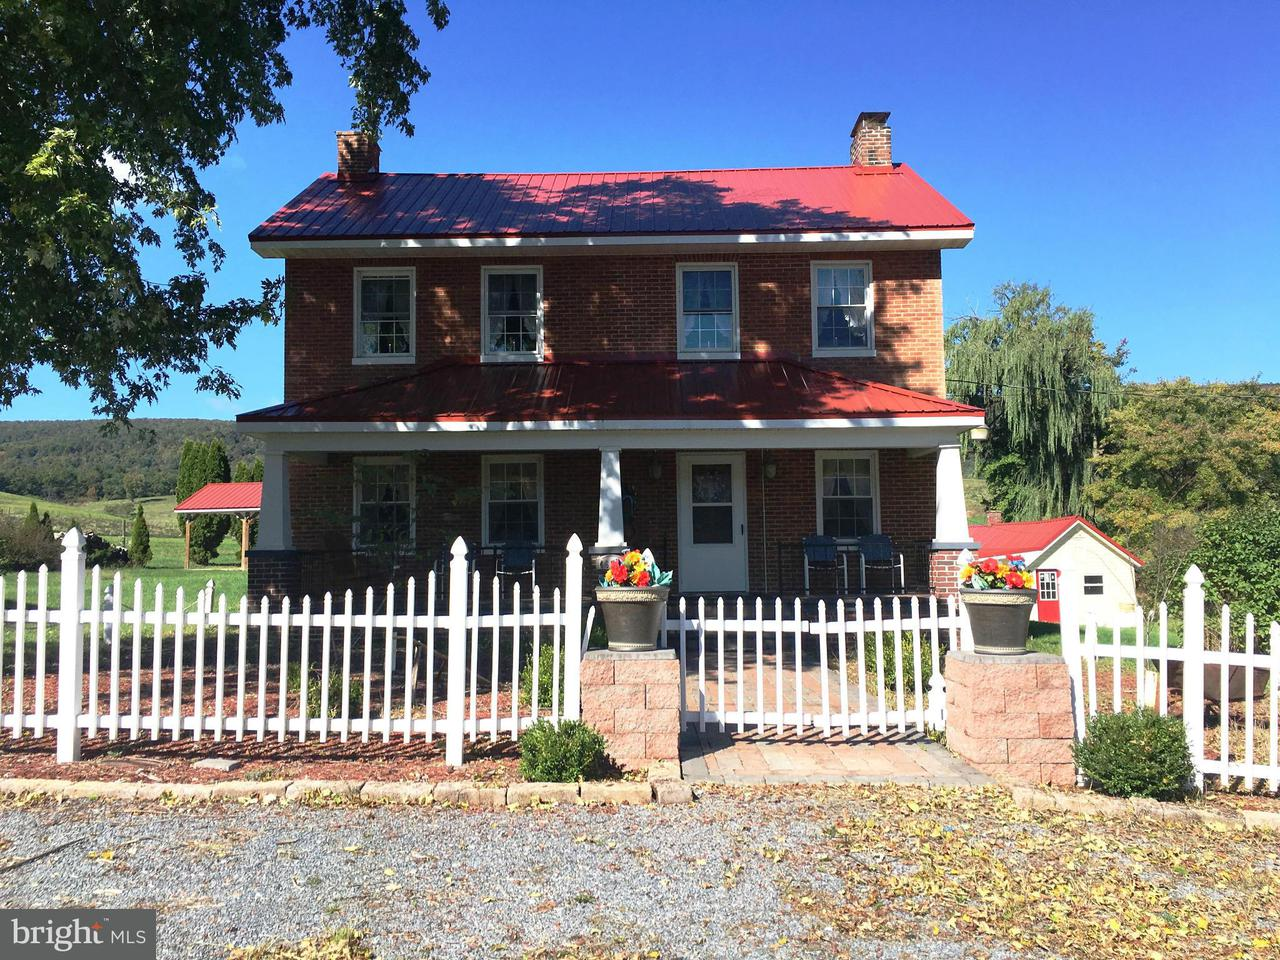 农场 为 销售 在 4625 BEDFORD VALLEY Road 4625 BEDFORD VALLEY Road Bedford, 宾夕法尼亚州 15522 美国